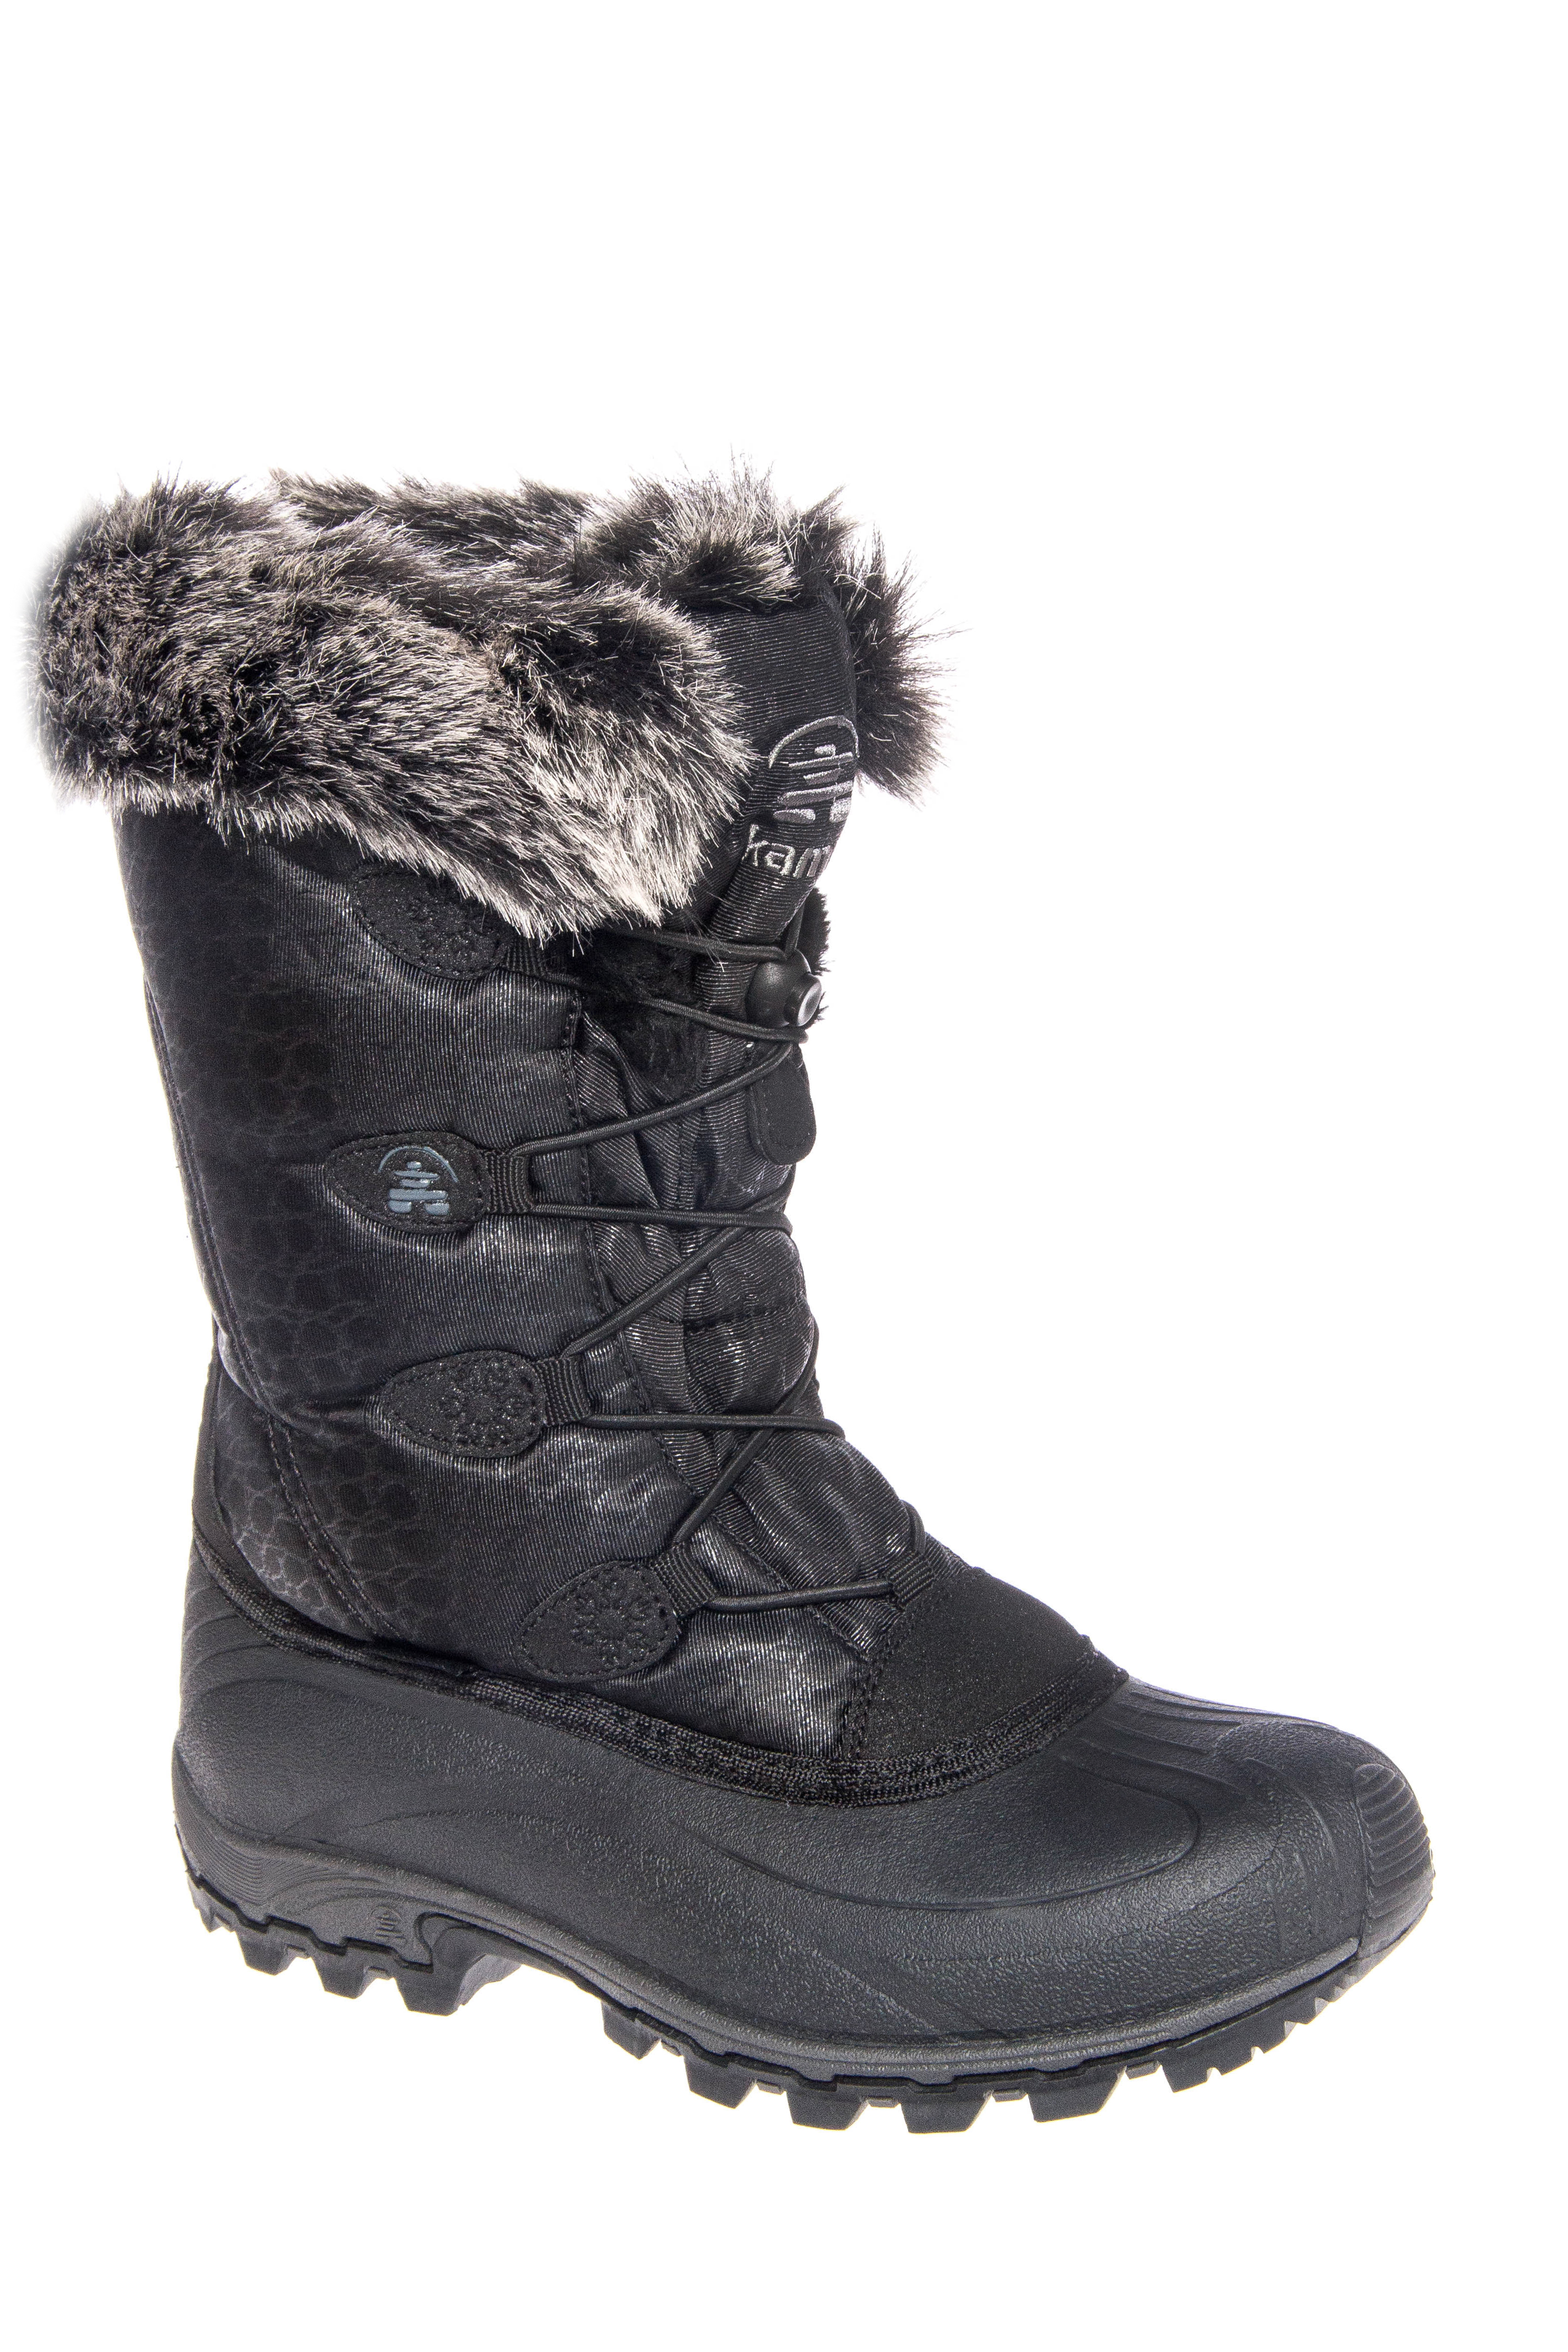 Kamik Momentum Snow Boots - Black